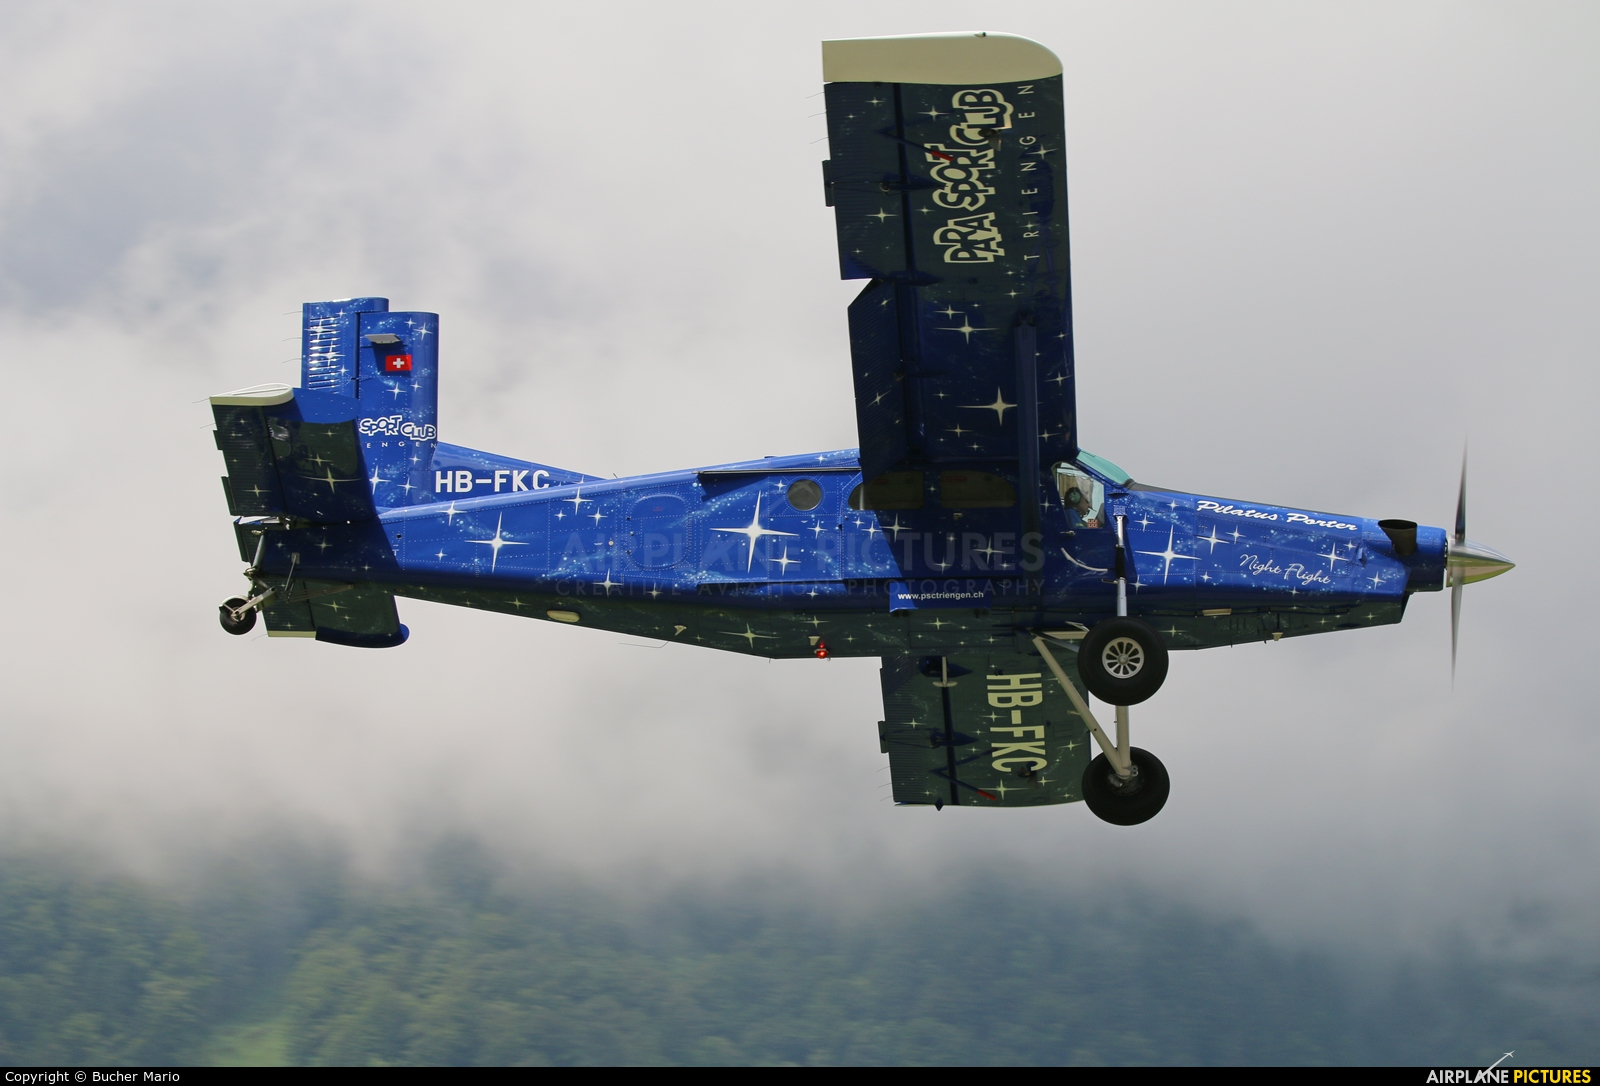 Private HB-FKC aircraft at Mollis